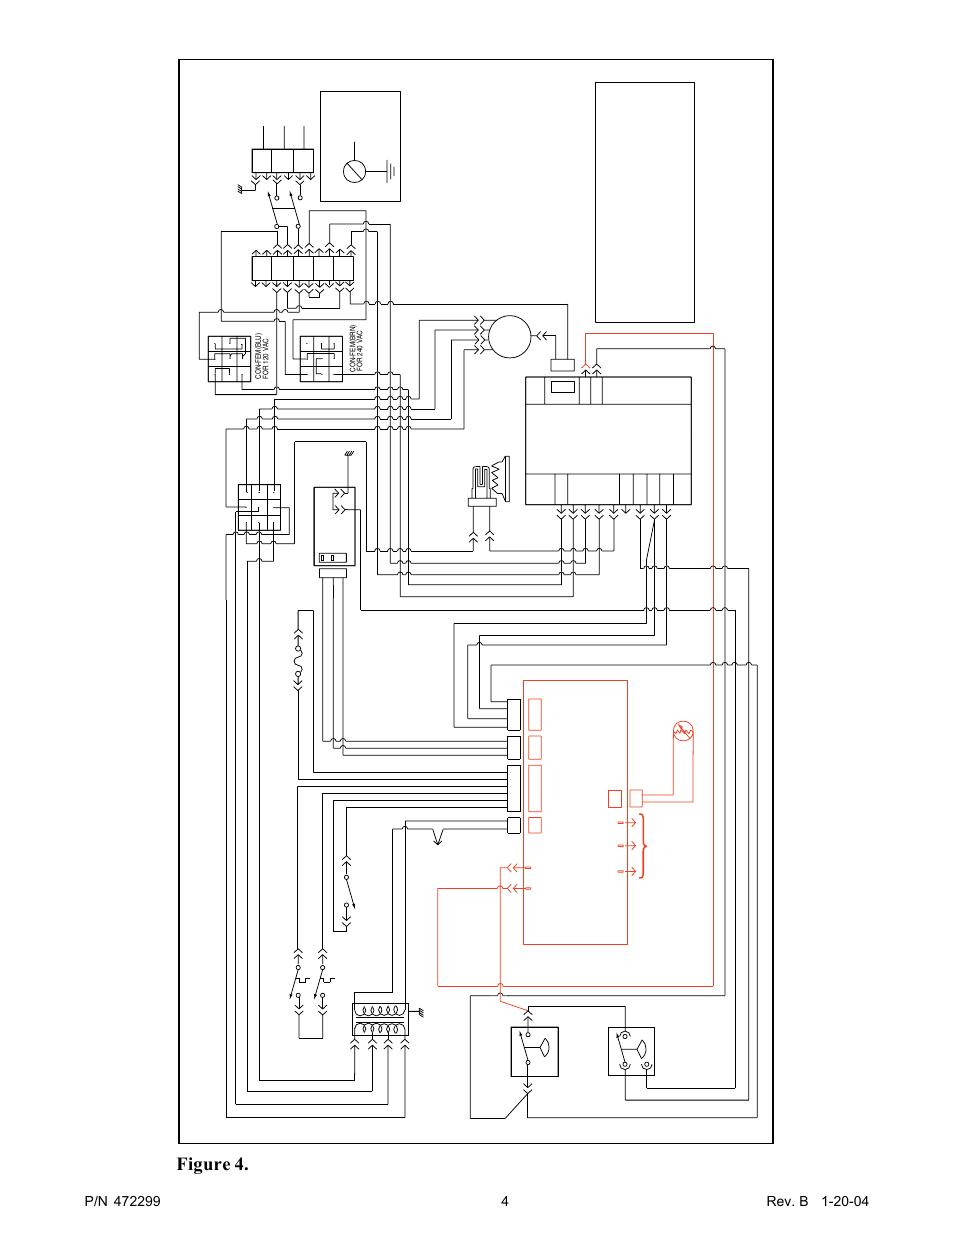 medium resolution of minimax wiring diagram wiring diagram mega pentair minimax 100 wiring diagram minimax wiring diagram